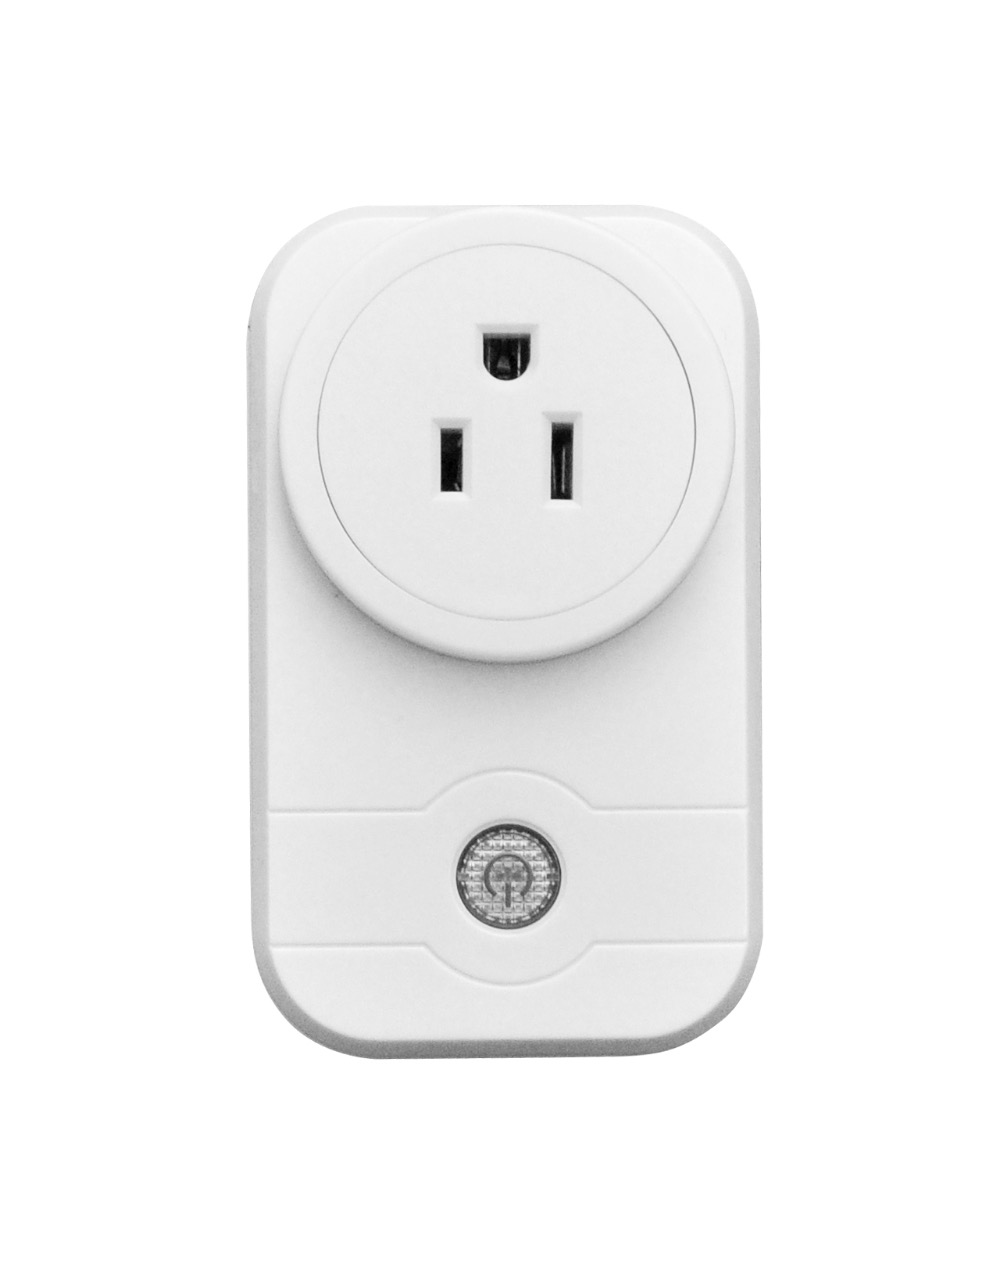 VStarcam WF831 Wifi Smart Power Socket Plug Small Electrical Socket ...